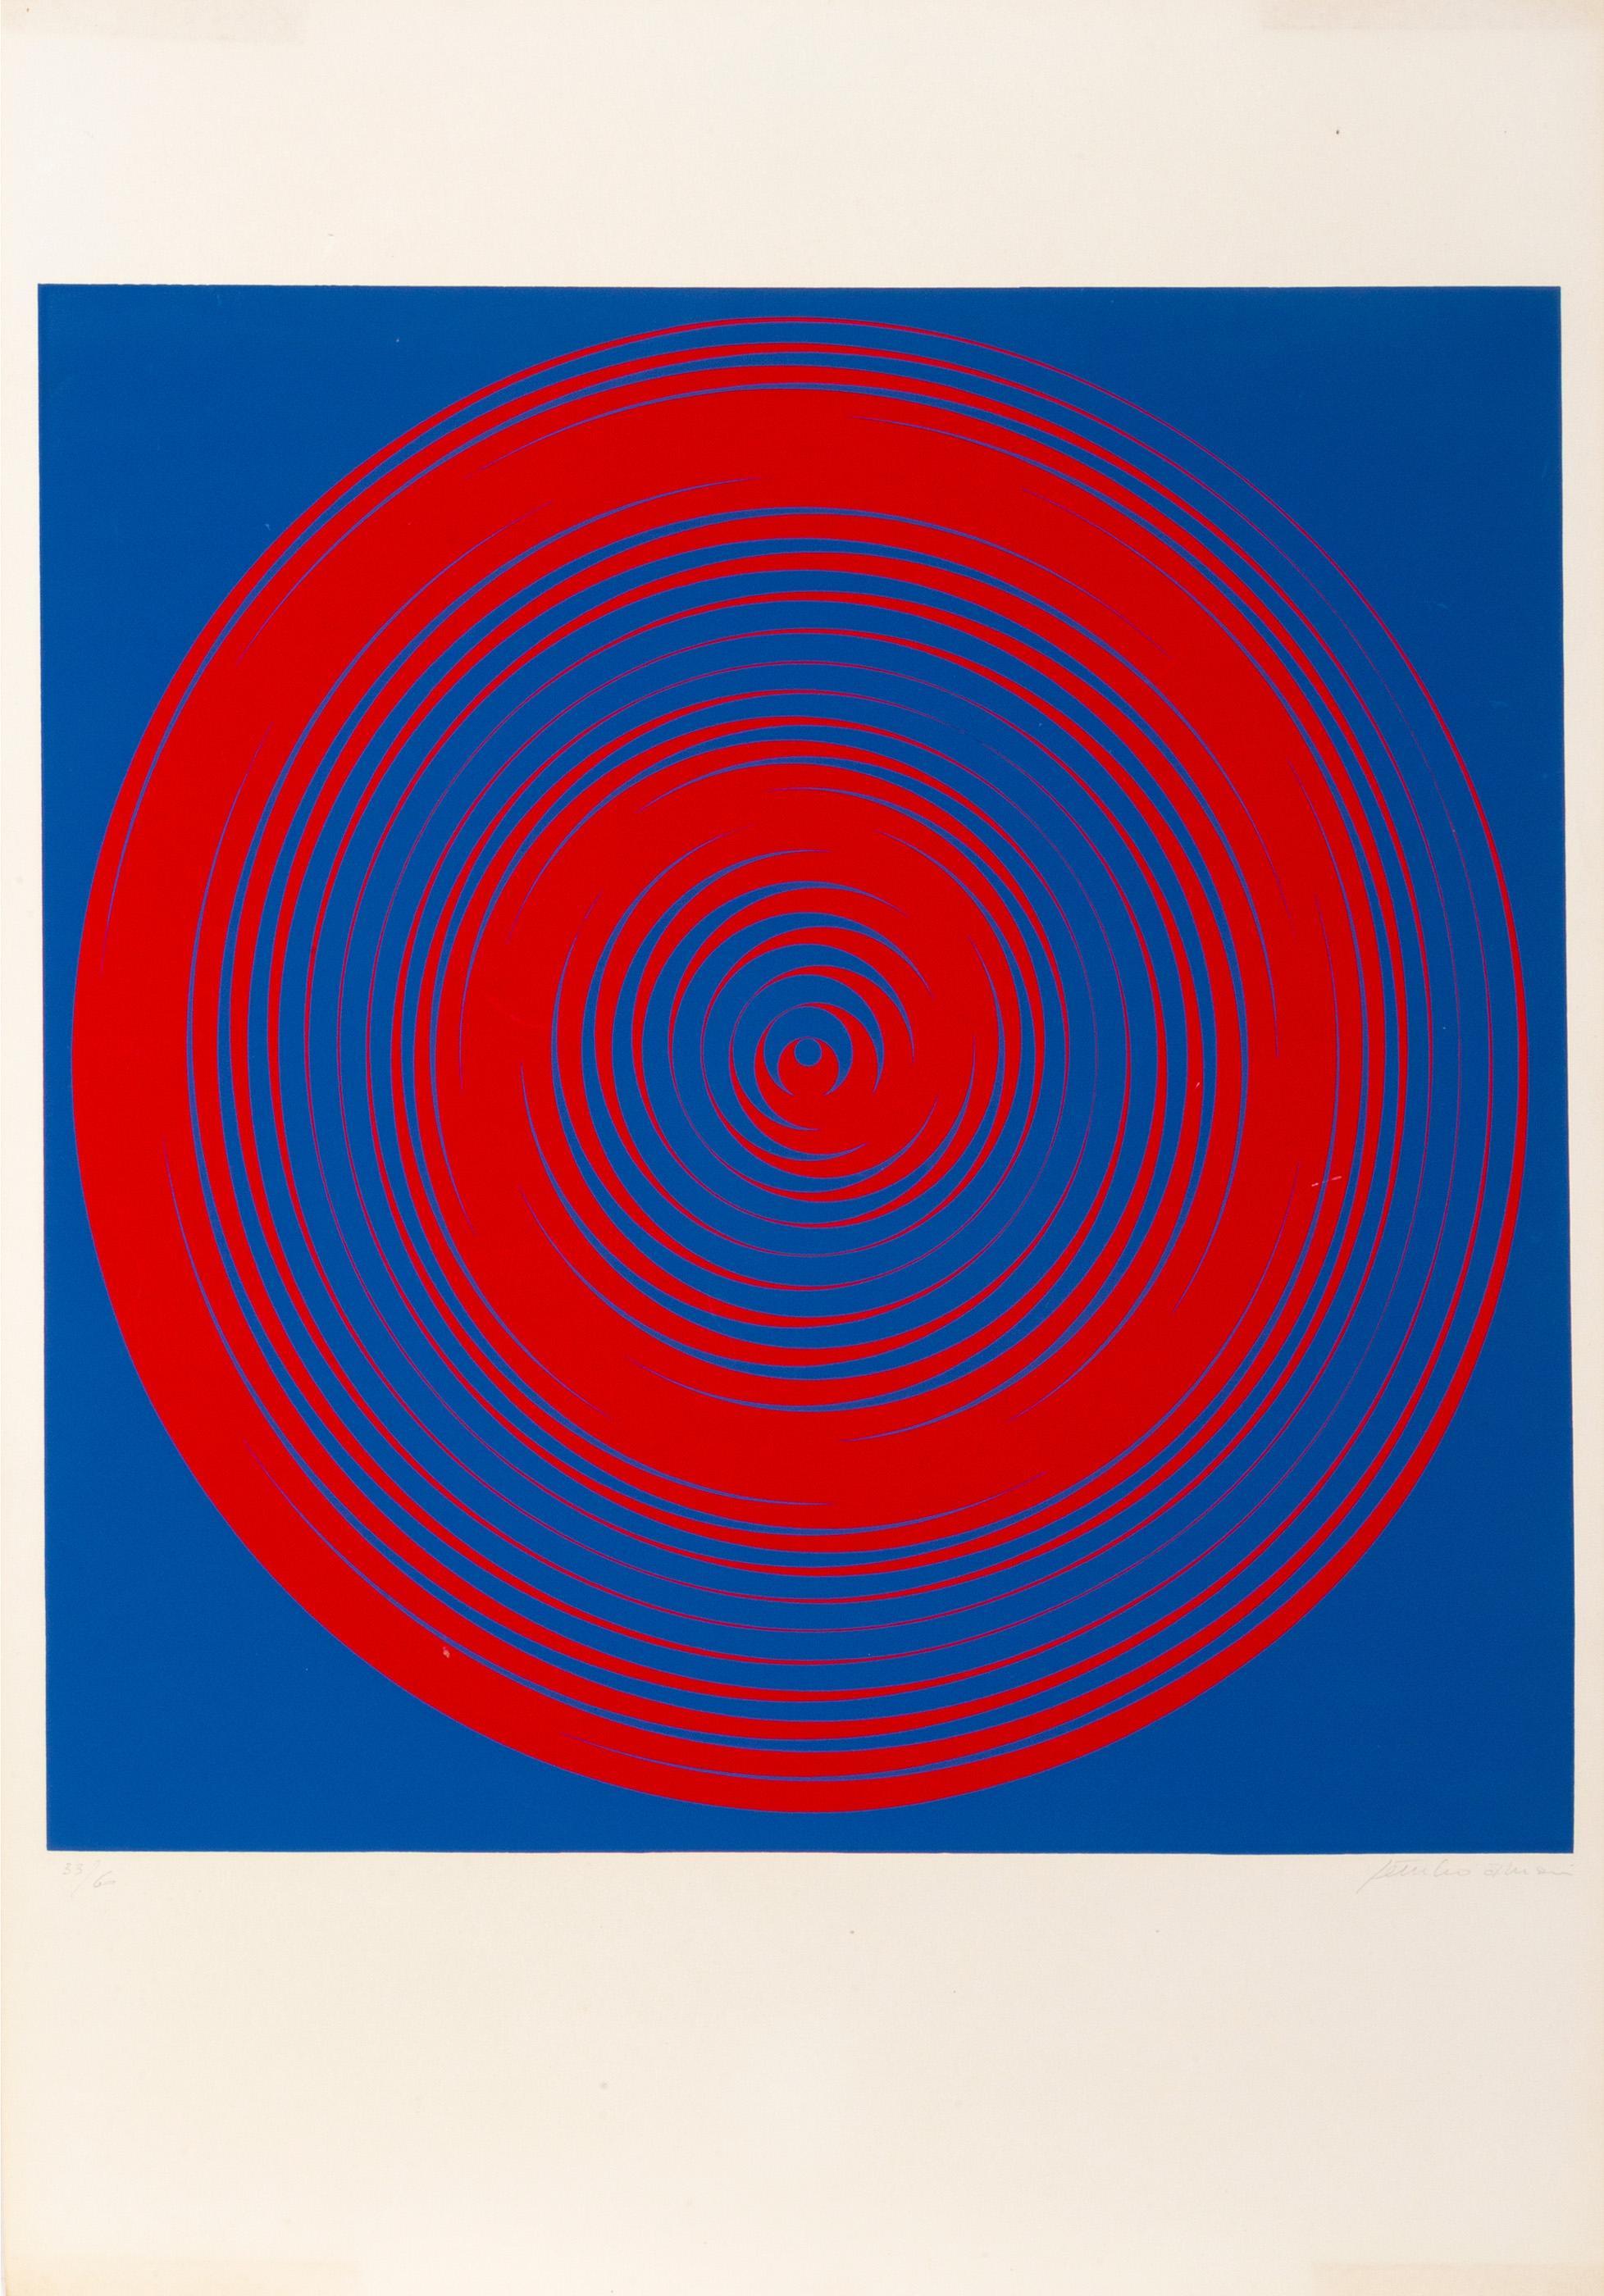 Getulio Alviani, Blue and Red Spirals, Screenprint